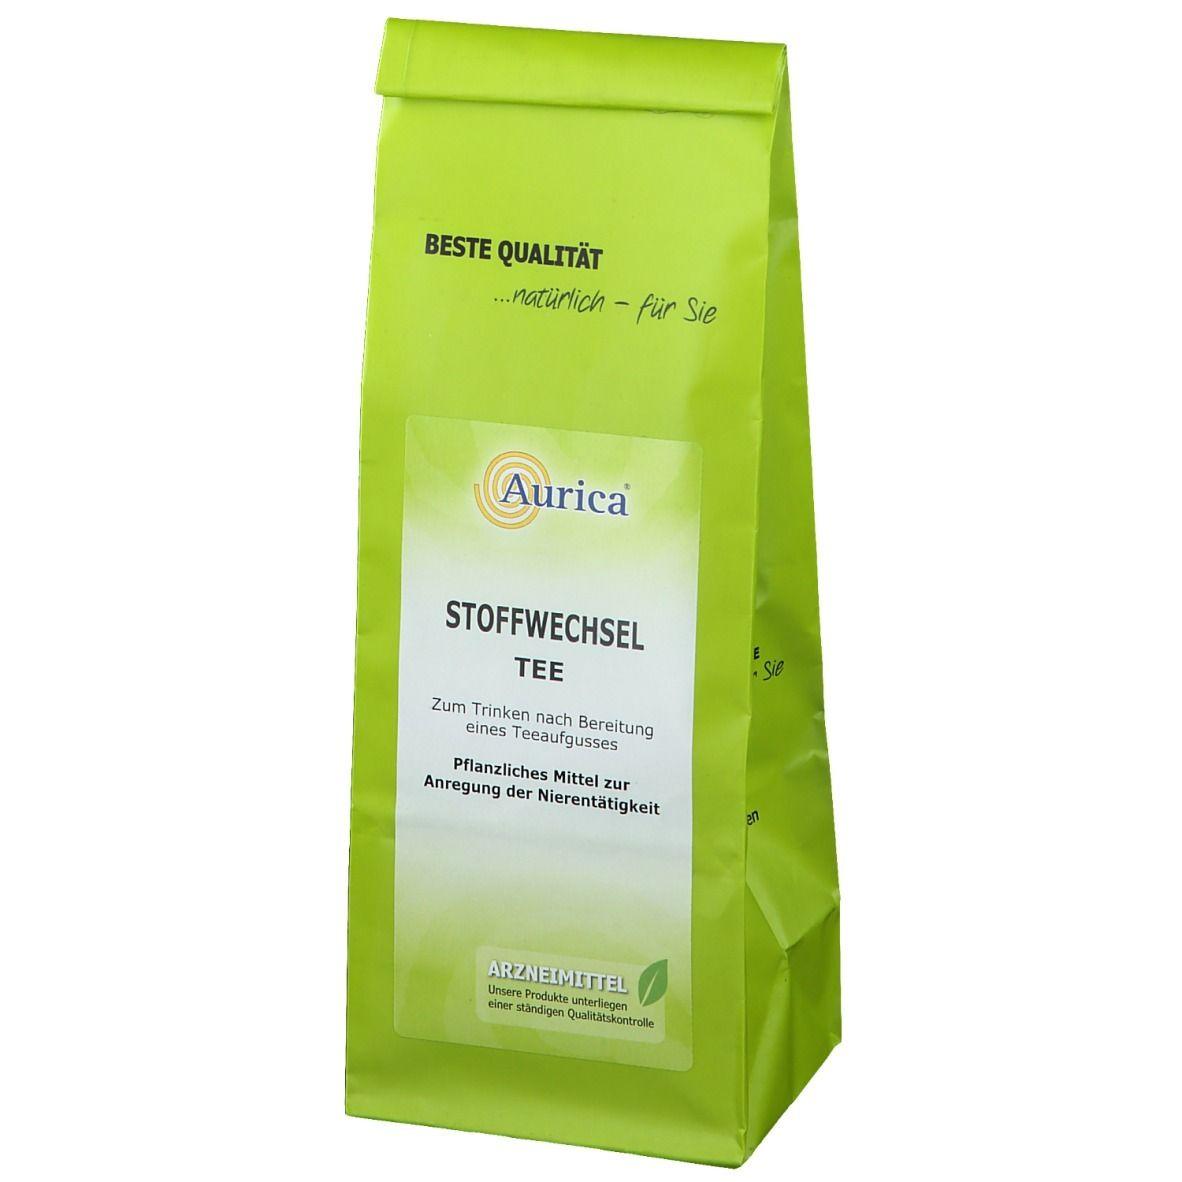 Aurica® Stoffwechsel Tee 100 g - shop-apotheke.com